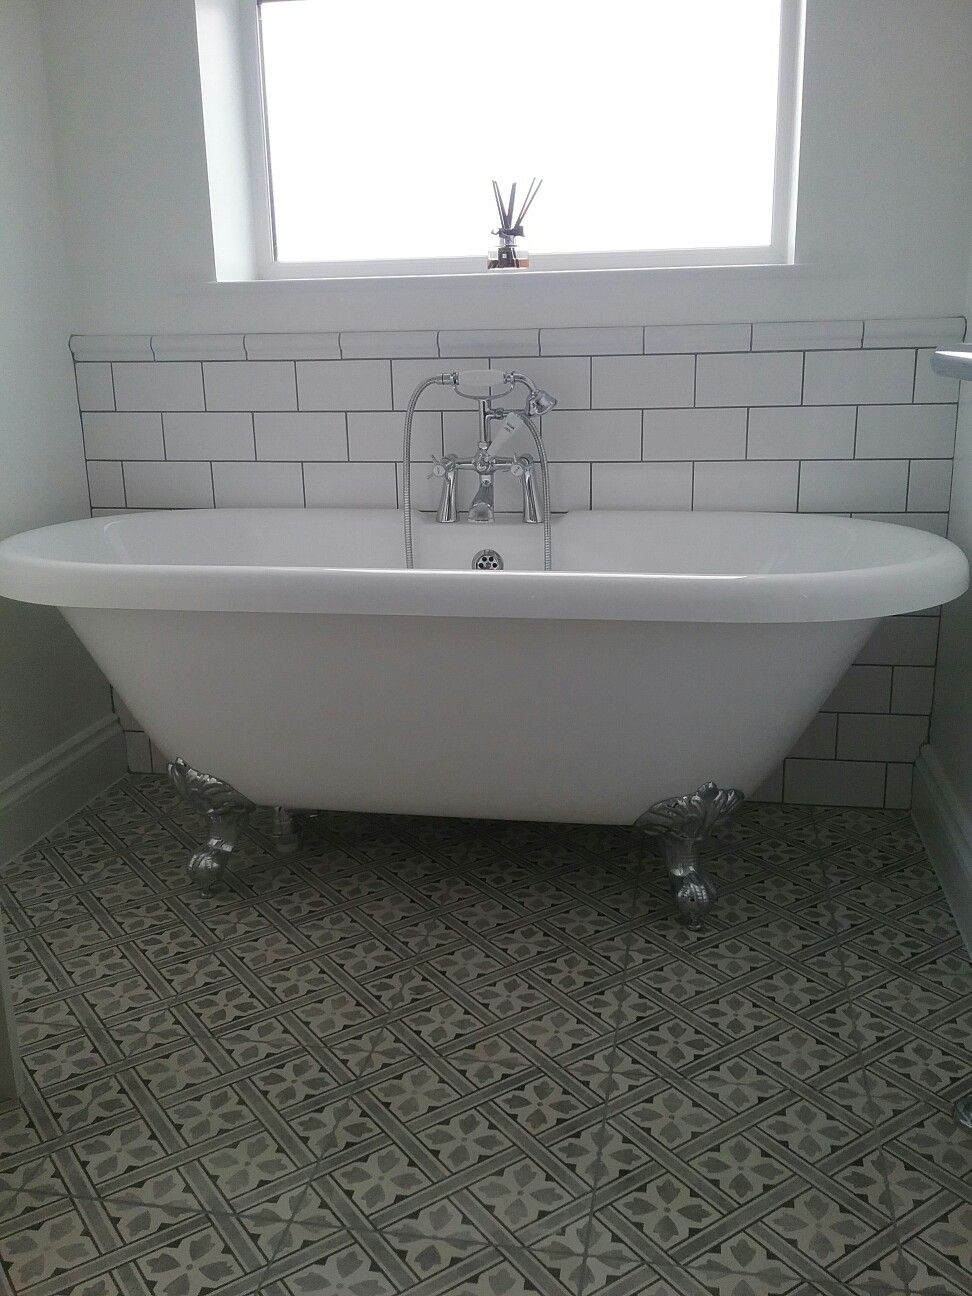 Laura Ashley Mr Jones Charcoal Tiles Compliment Our Roll Top Bath Roll Top Bath Bathroom Design Bathroom Interior